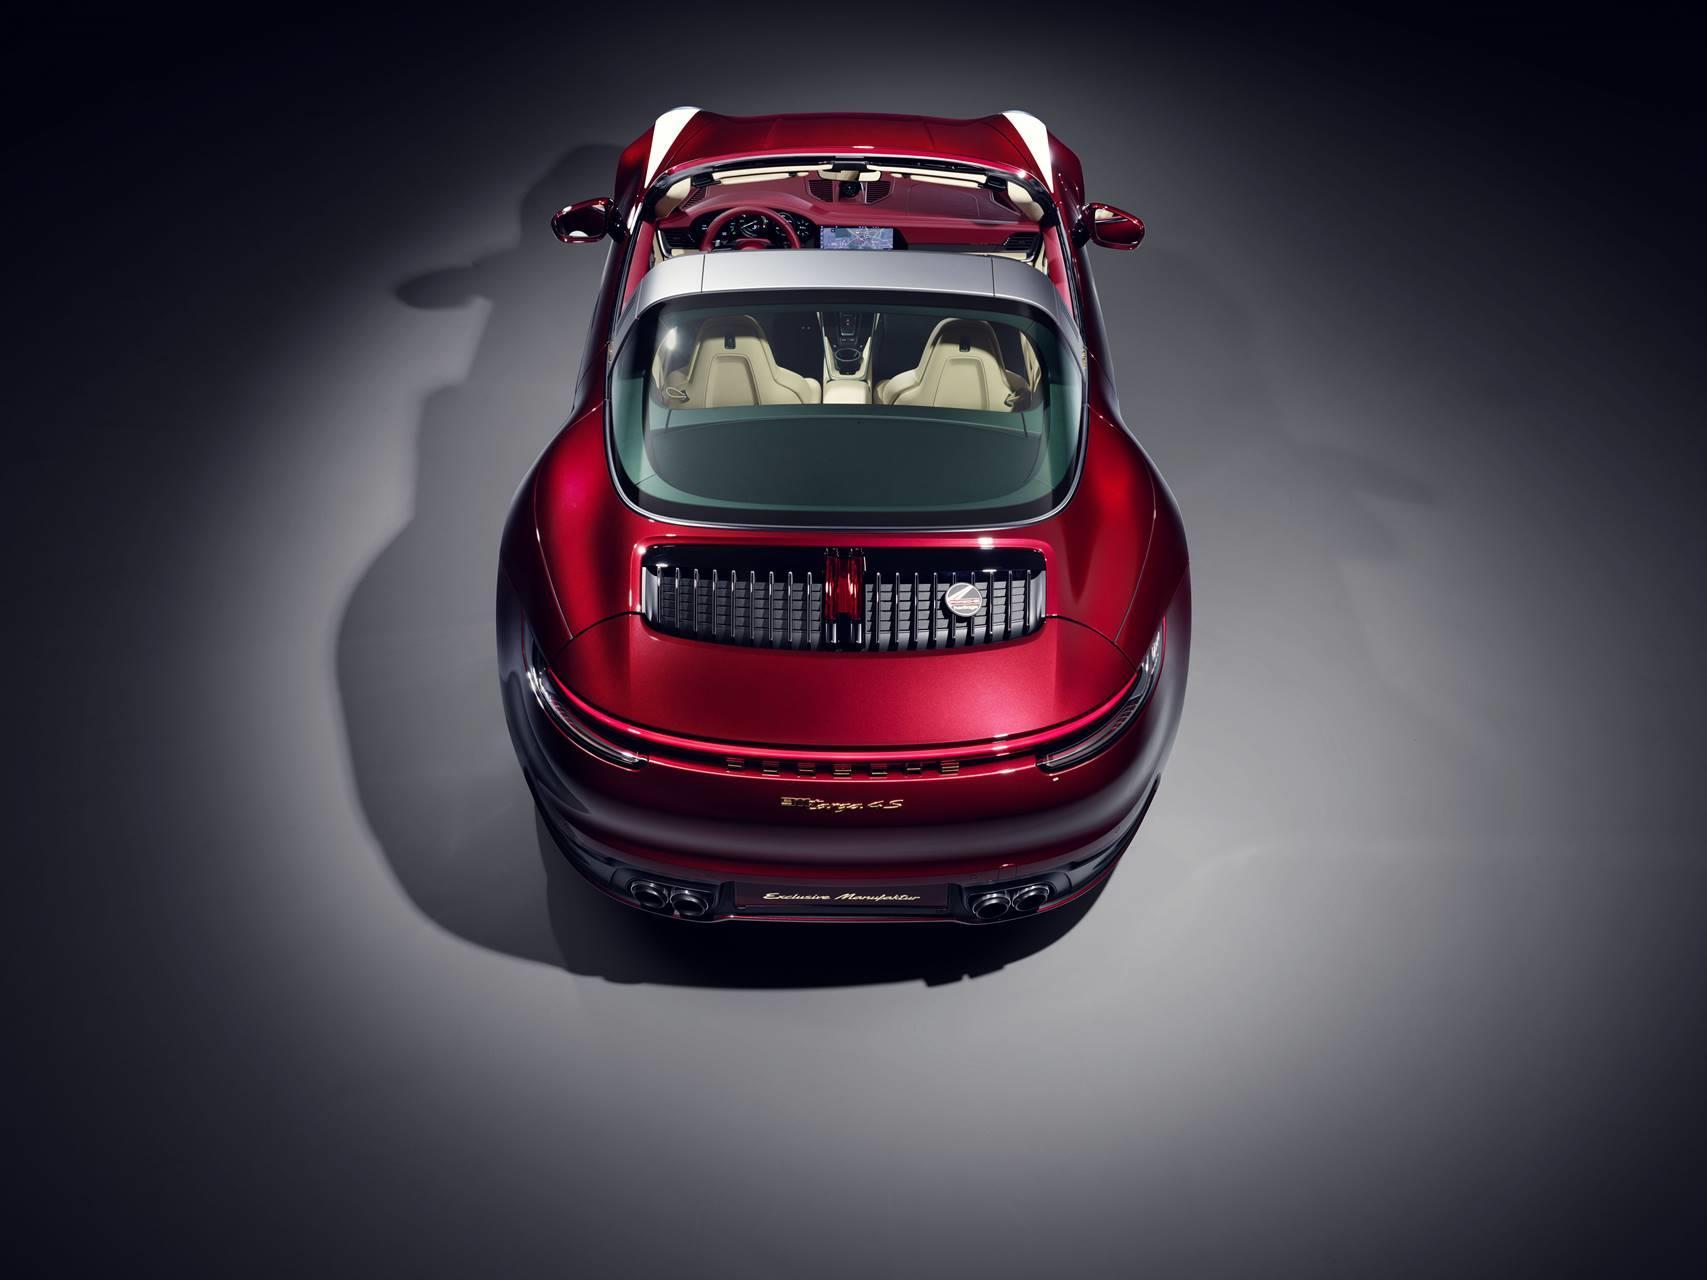 2021 Porsche 911 Targa 4S Heritage Design Edition